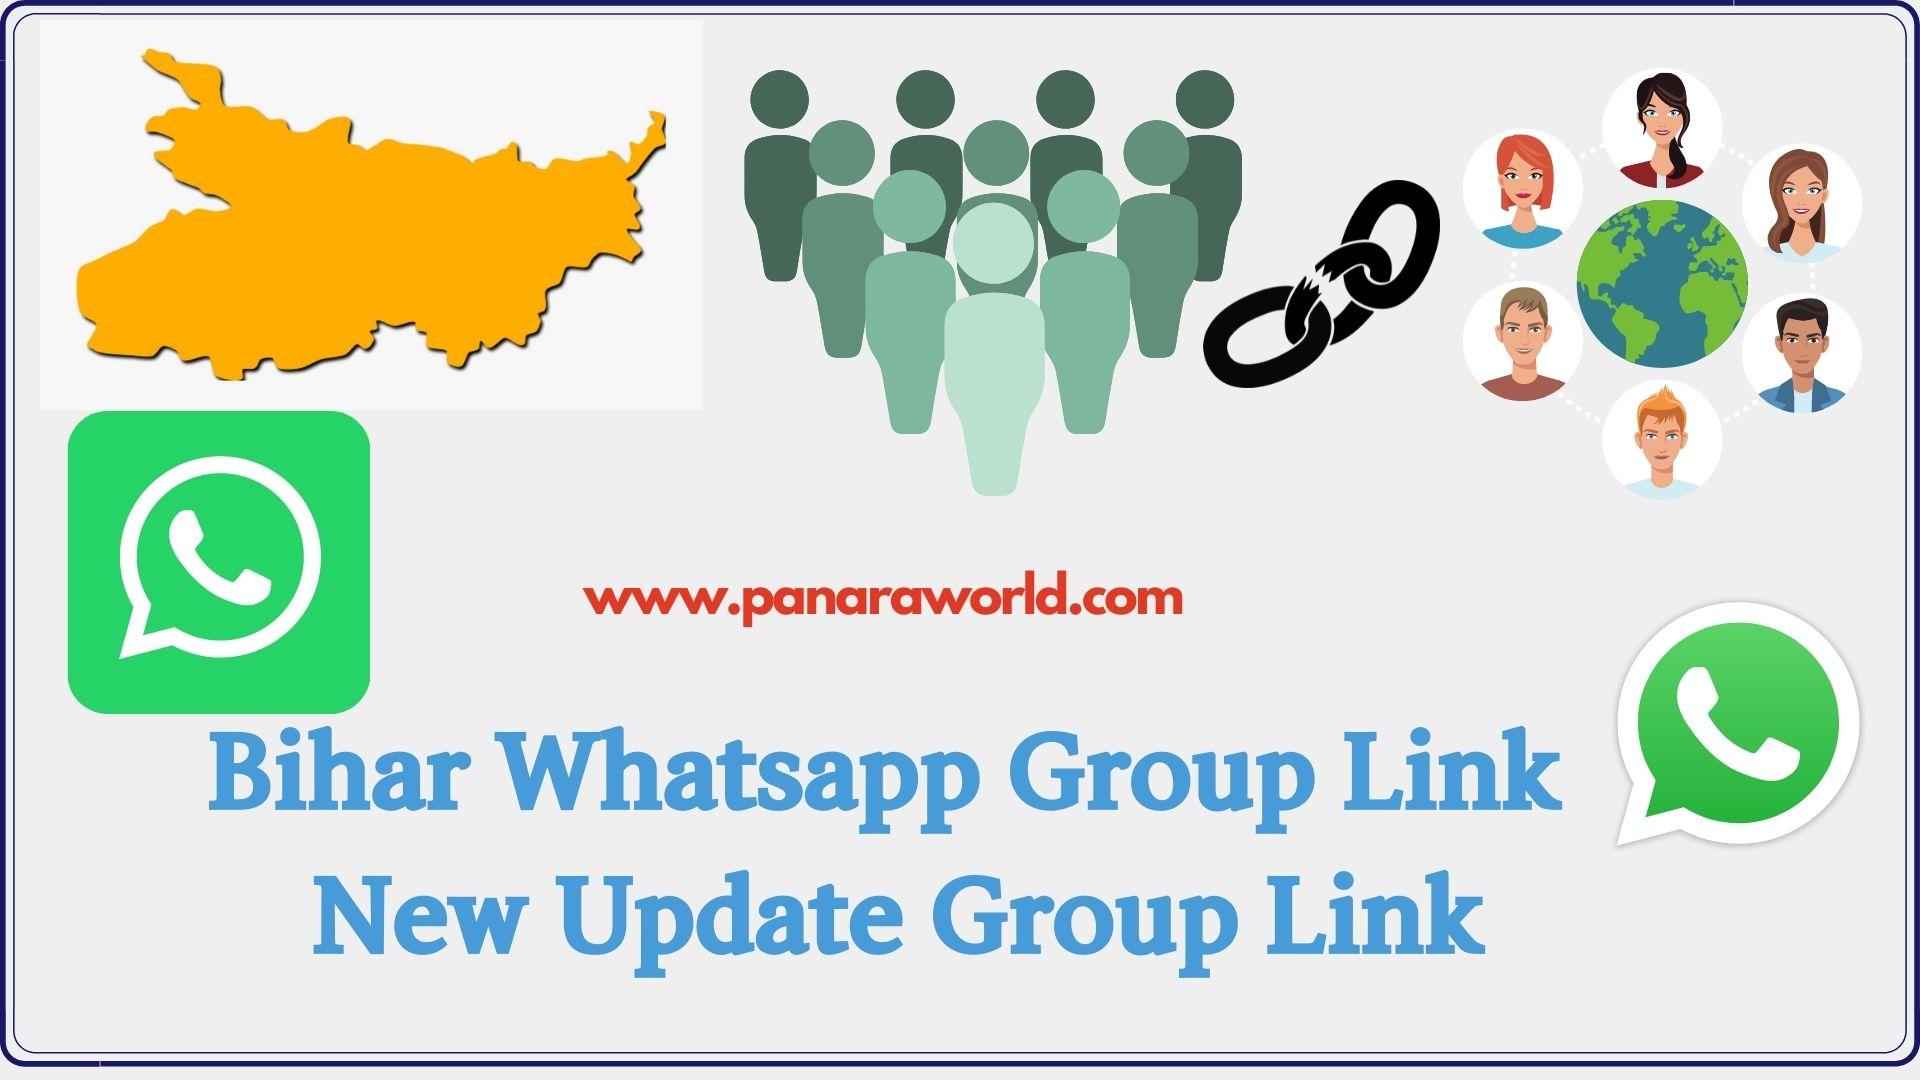 Bihar Whatsapp Group Link 2021 *New Update Group Link